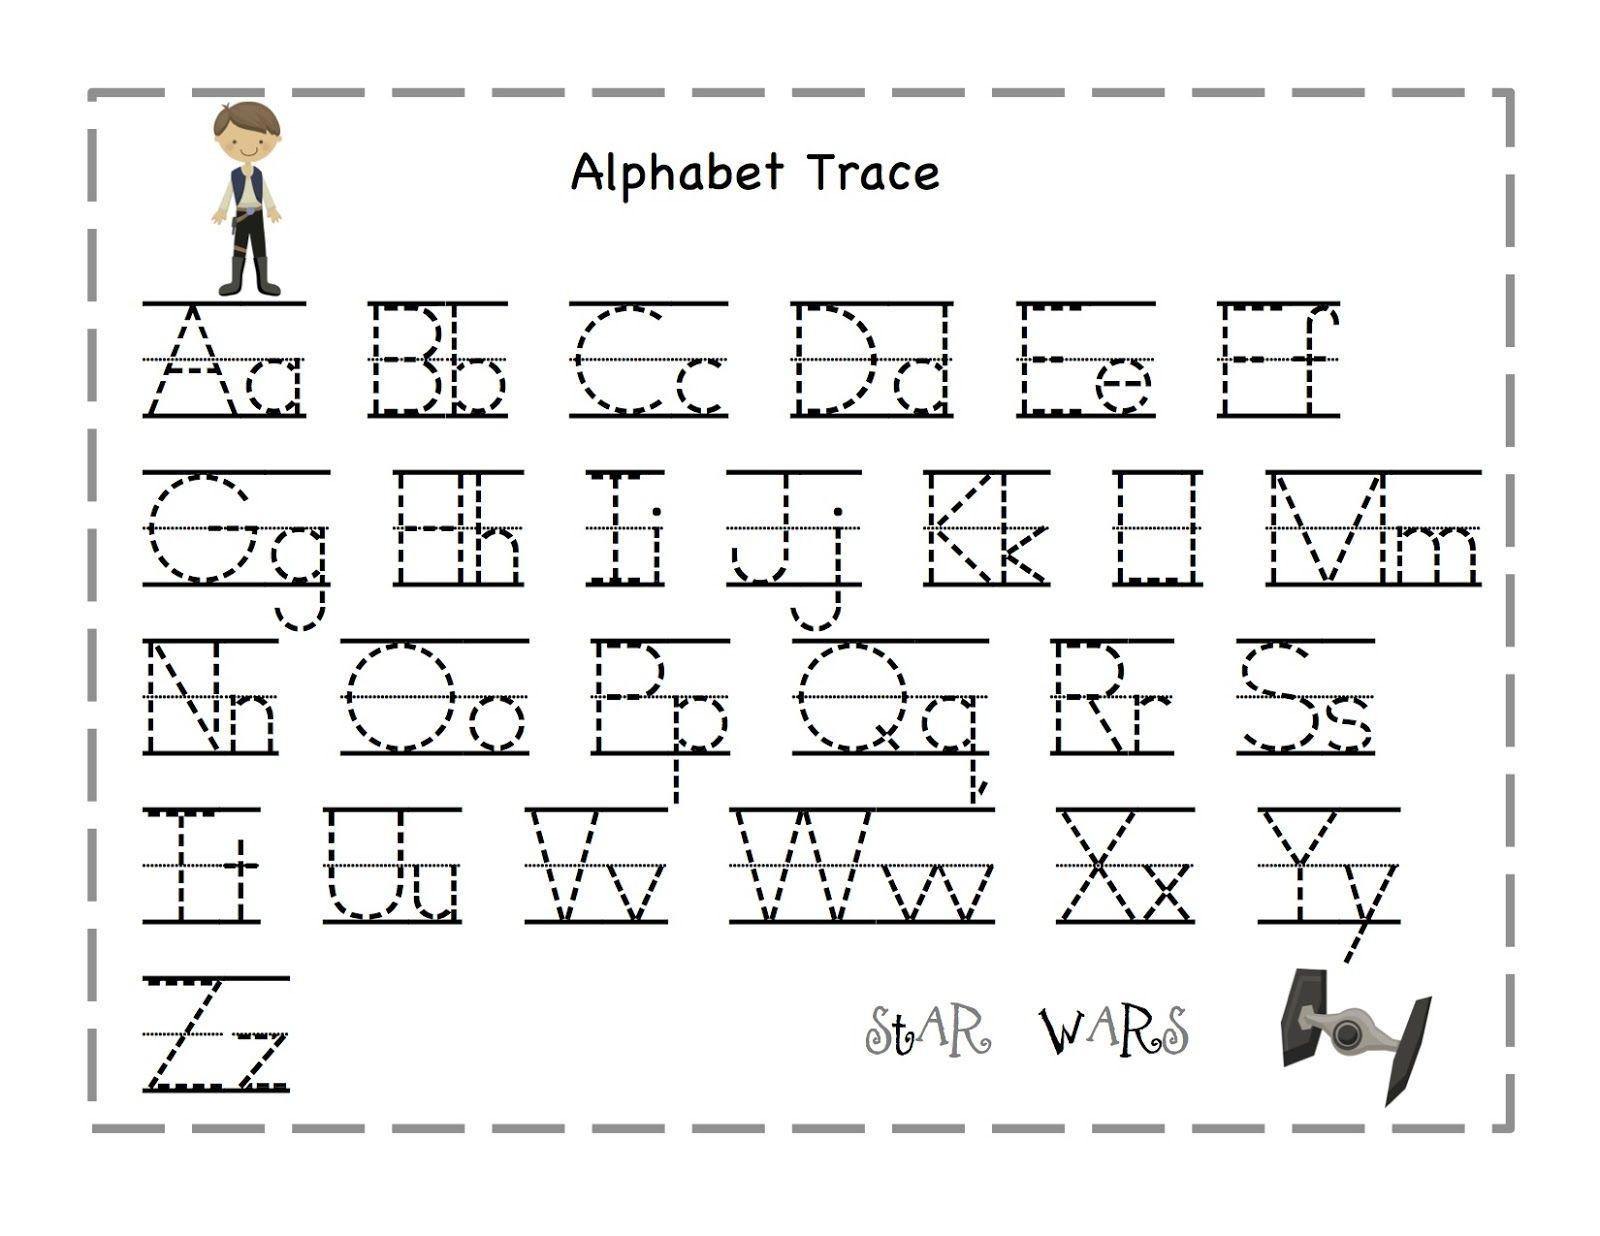 The Alphabet Tracing